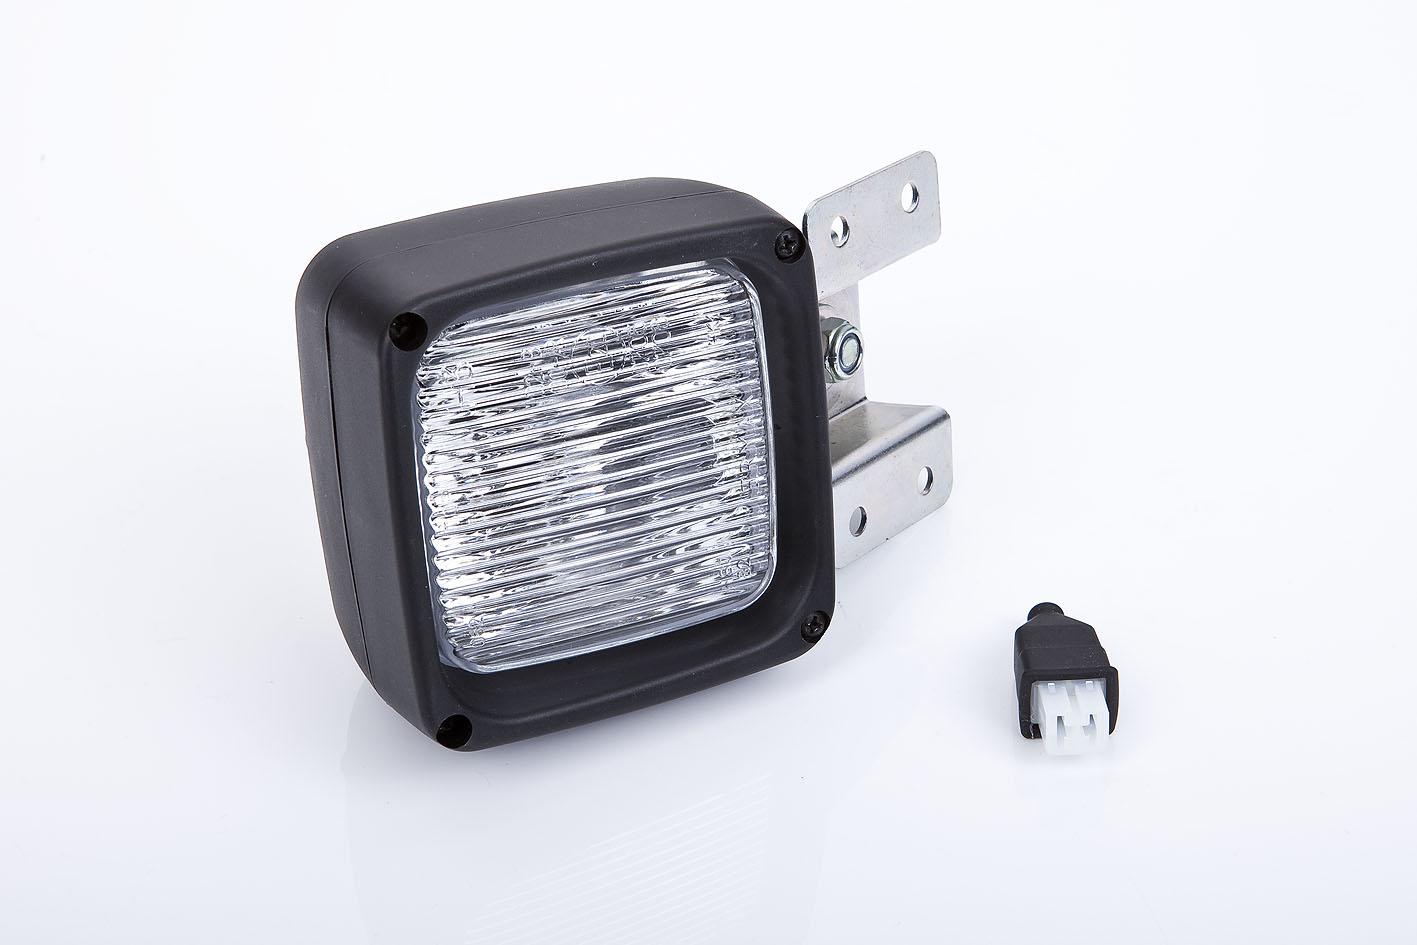 r ckfahrscheinwerfer beleuchtung fahrzeugelektrik. Black Bedroom Furniture Sets. Home Design Ideas